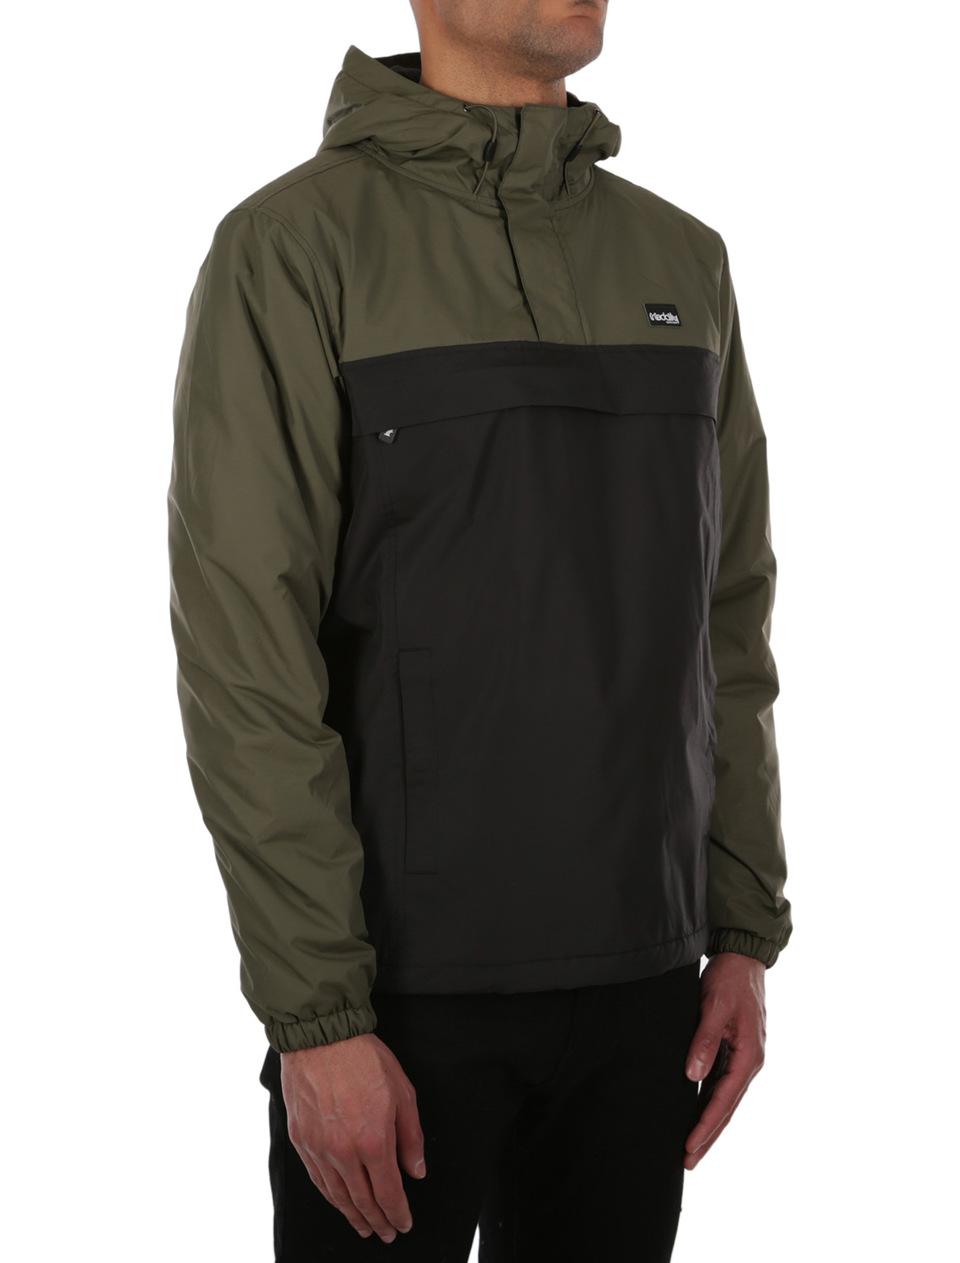 Jacket Olive Iriedaily Black Insulaner Breaker 5qWpaa